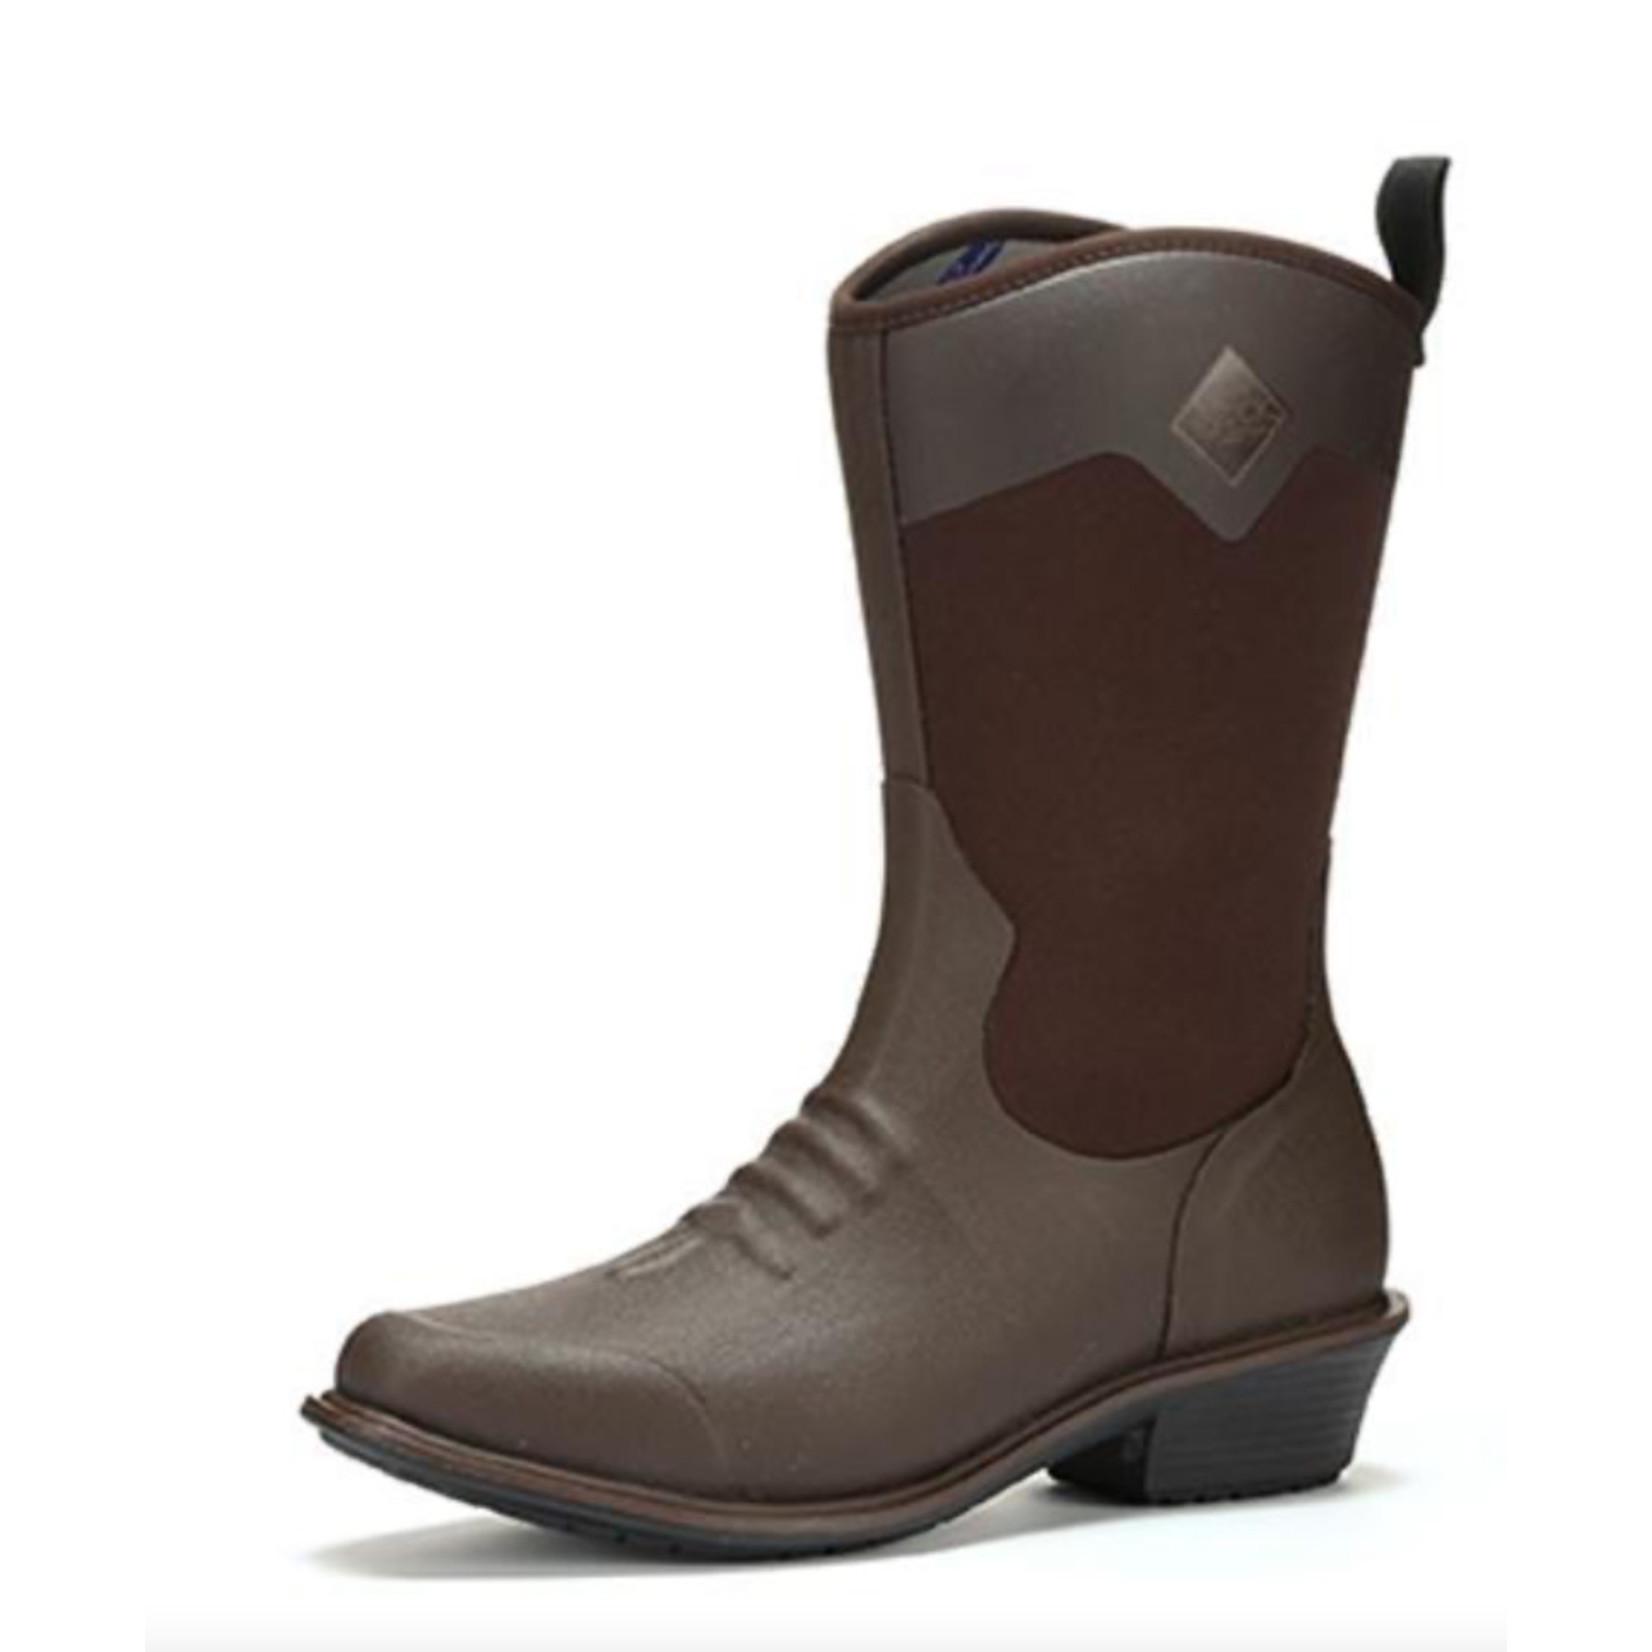 Muck Muck Women's Ryder II Waterproof Riding Boot Brown Xpresscool Lining Subzero Rating